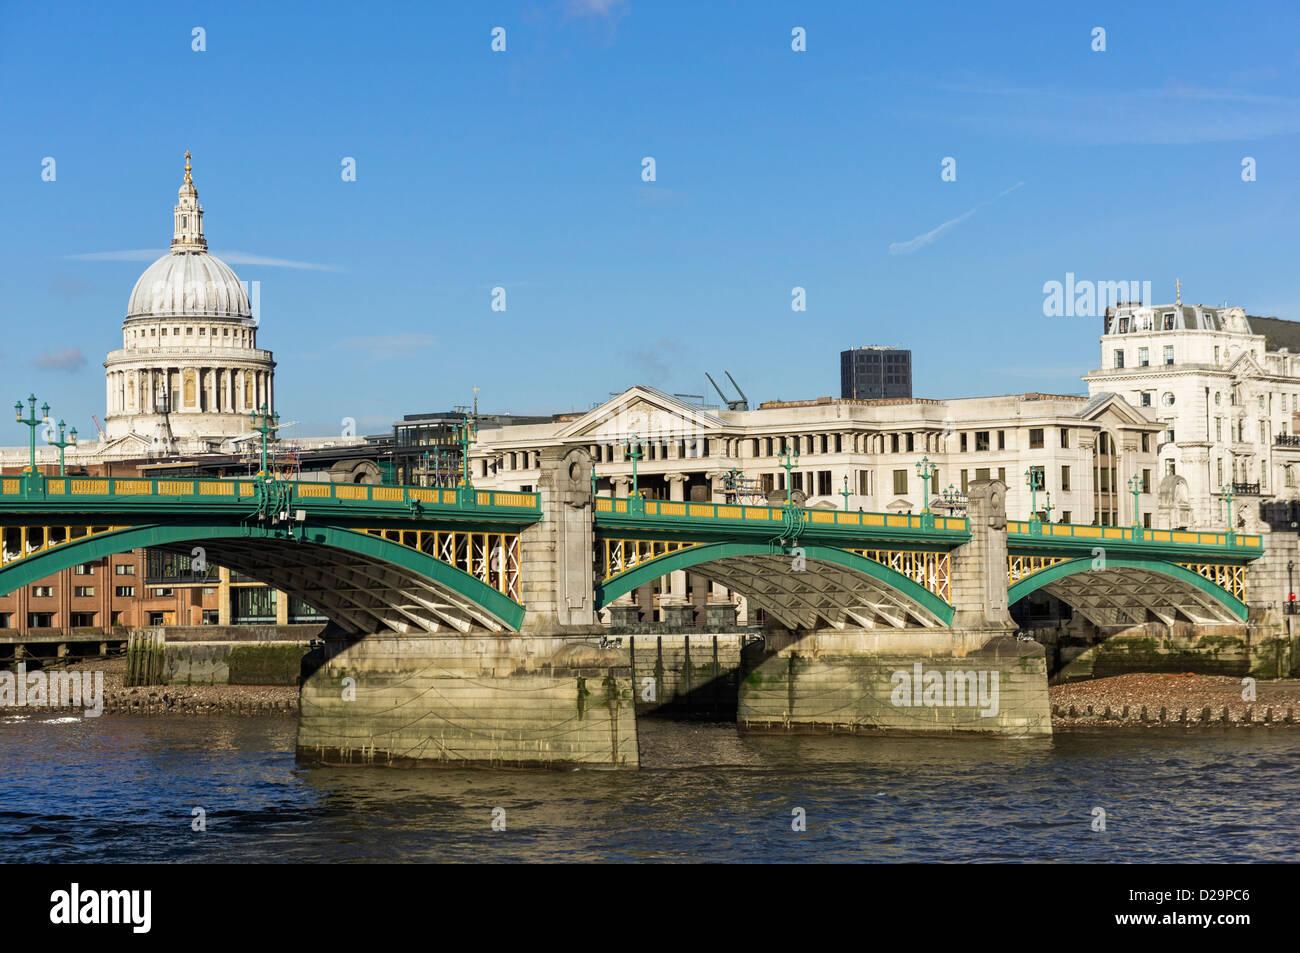 Southwark Bridge, London, UK - Stock Image